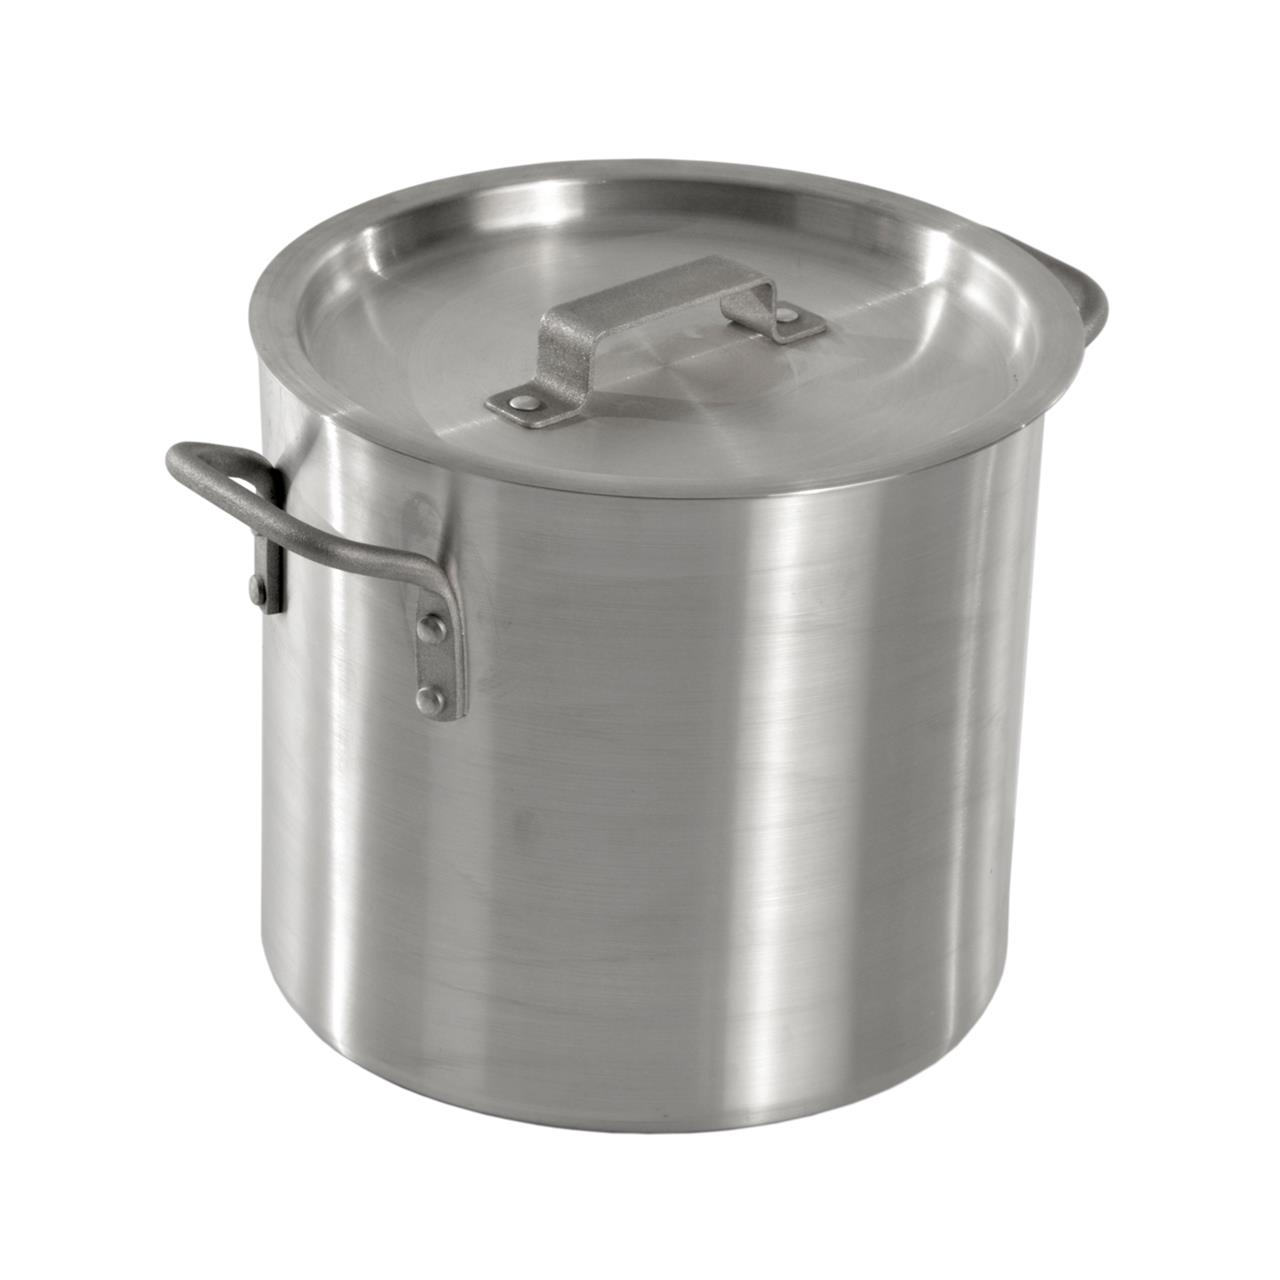 KH Aluminium Stockpot